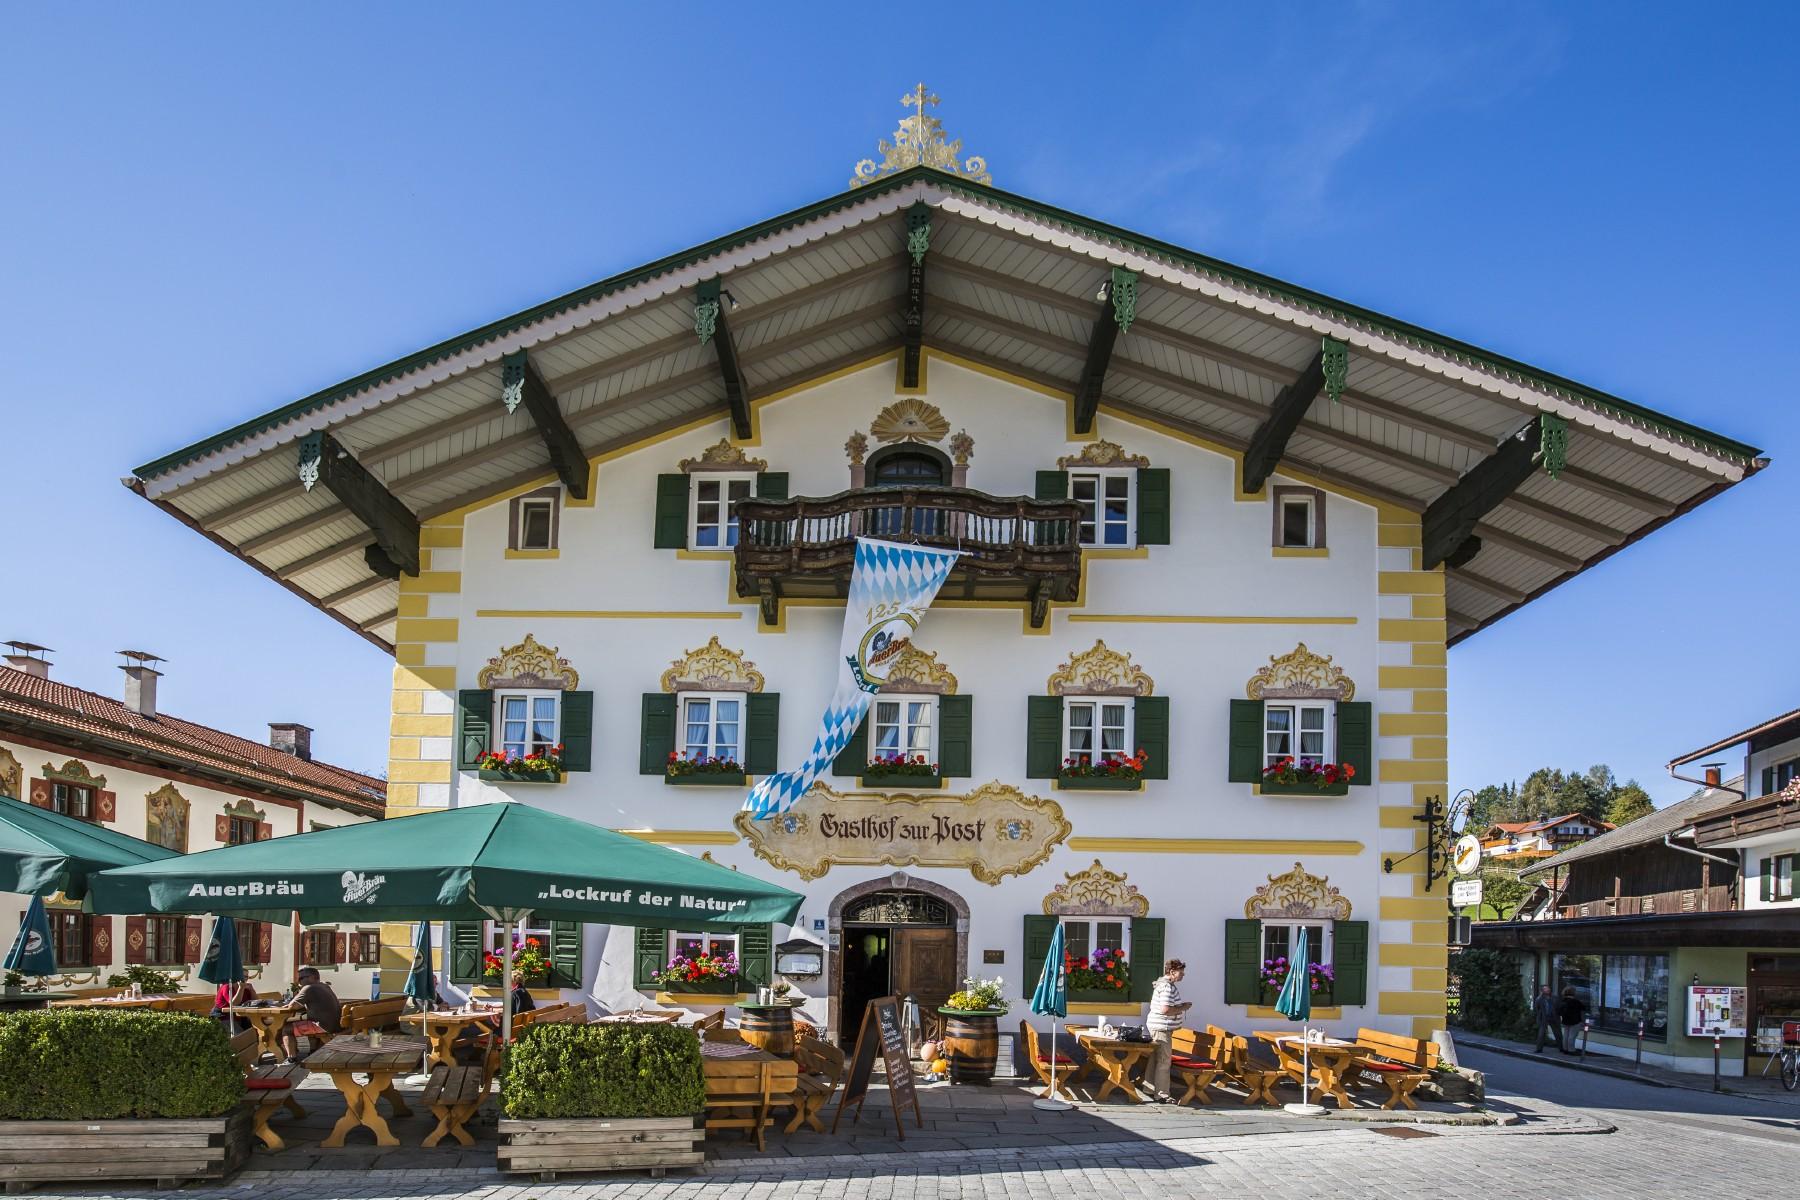 biergarten-chiemsee-alpenland.jpg